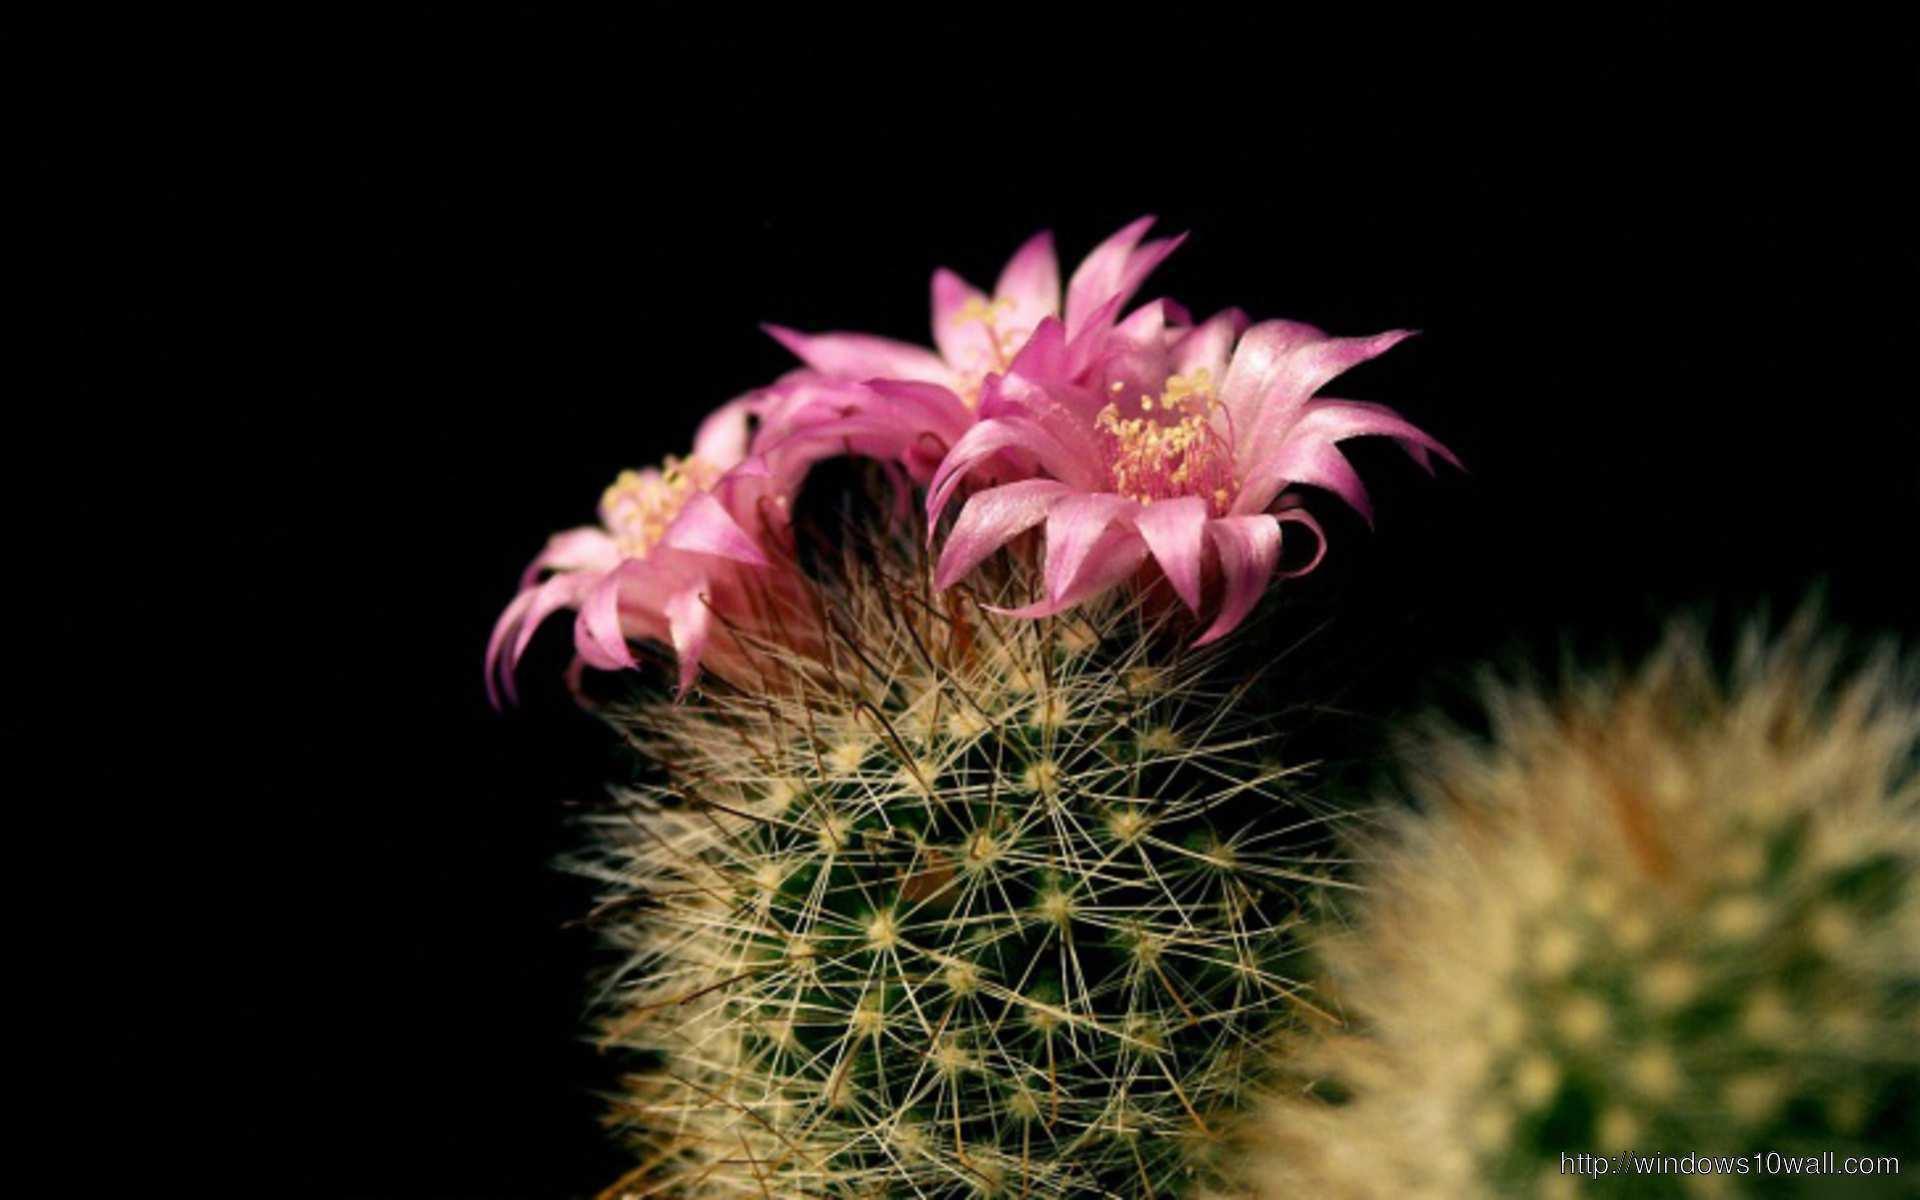 Beautiful Cactus Pink Flower Wallpaper Windows 10 Wallpapers